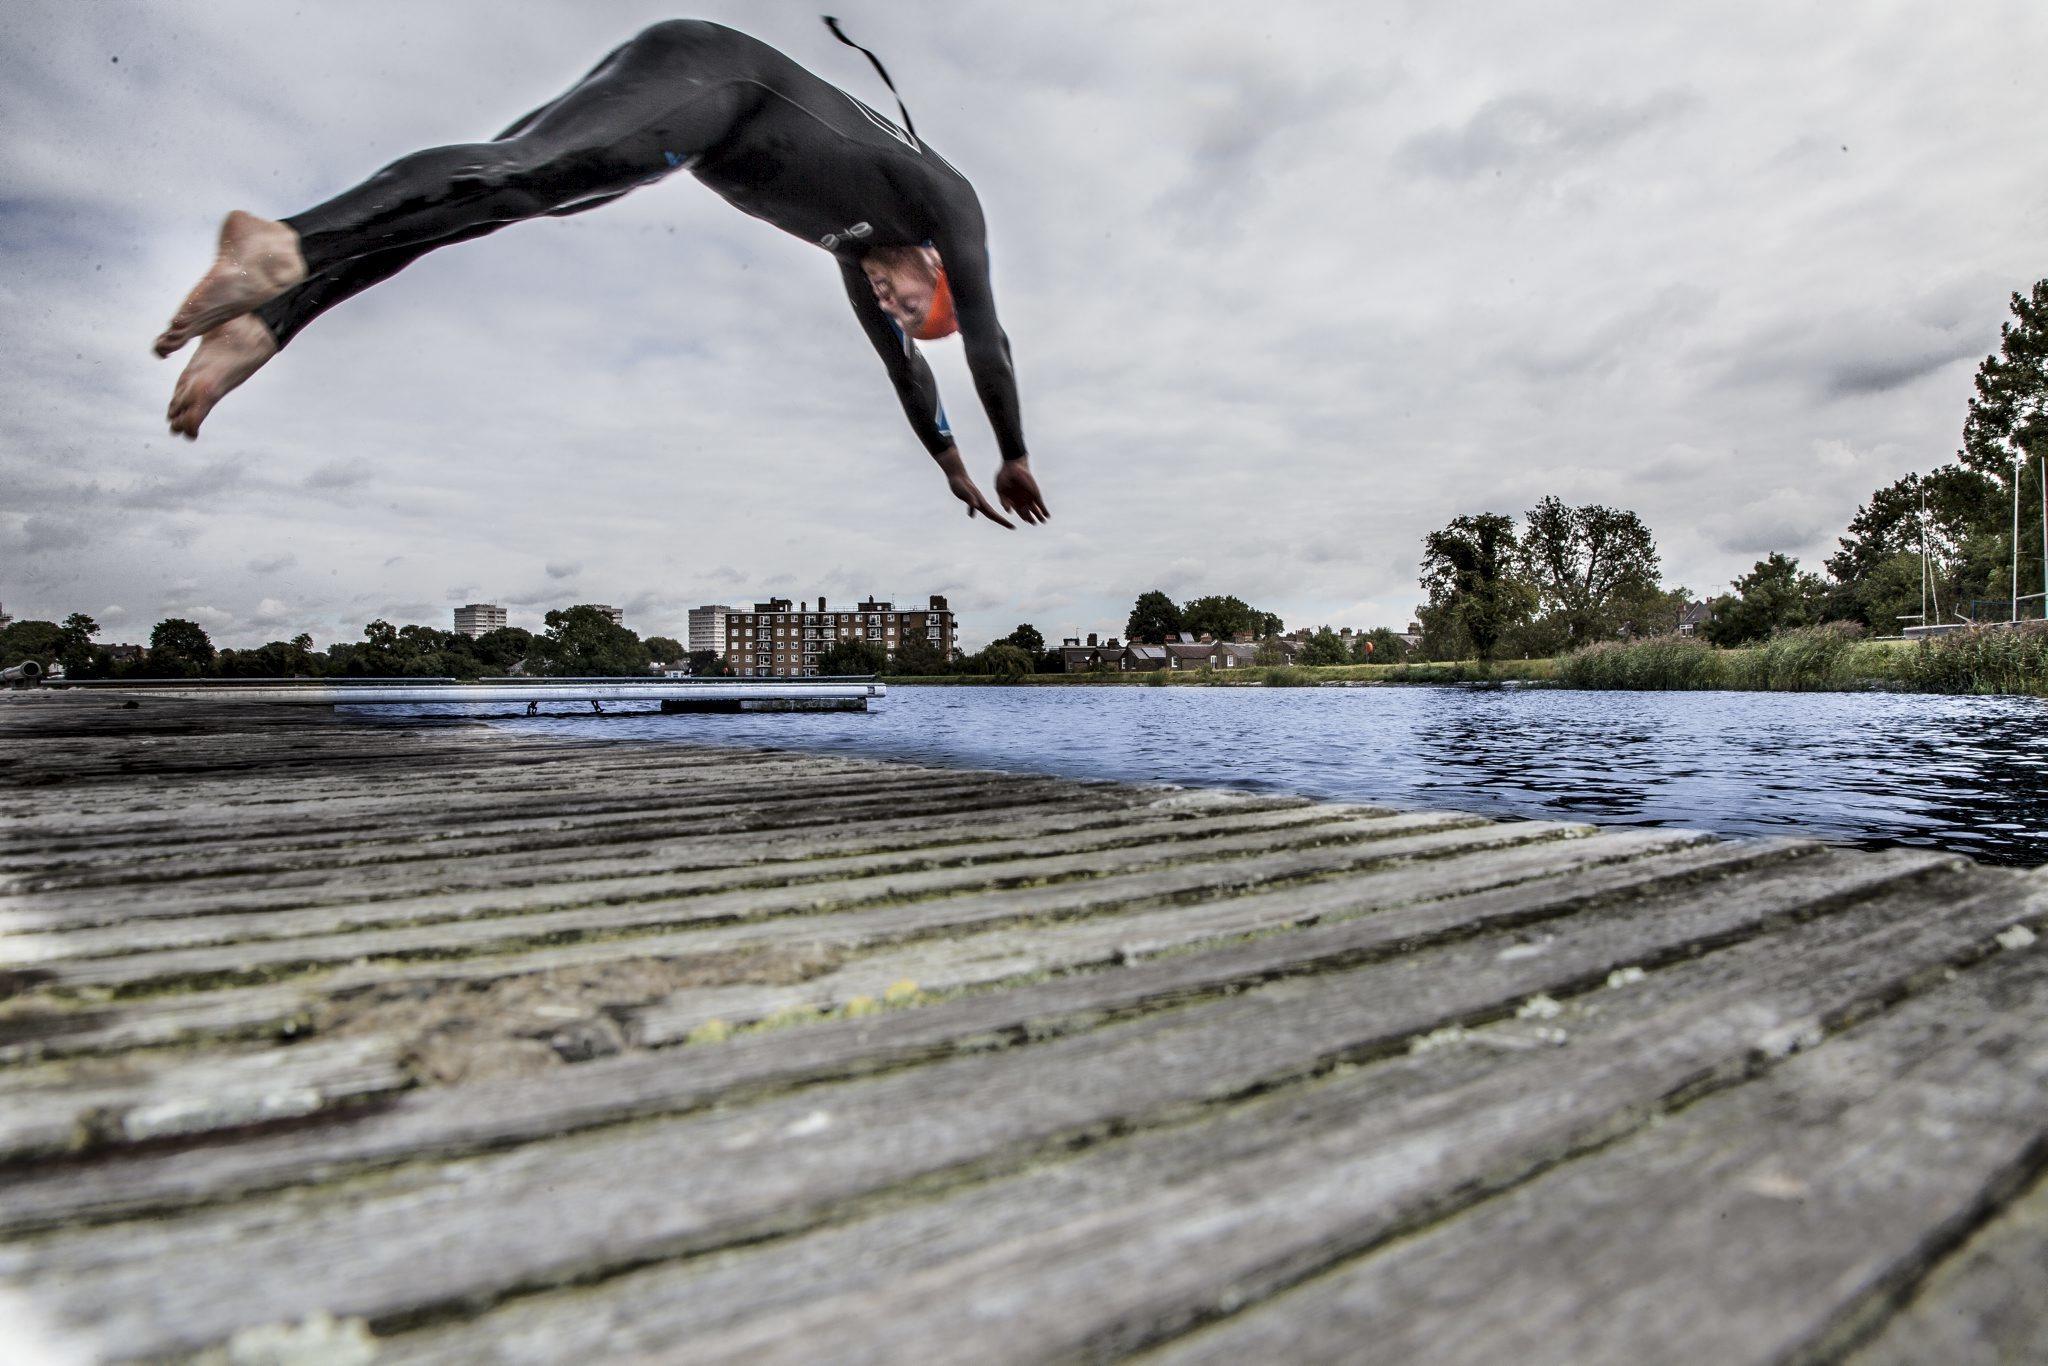 Stoke Newington West Reservoir